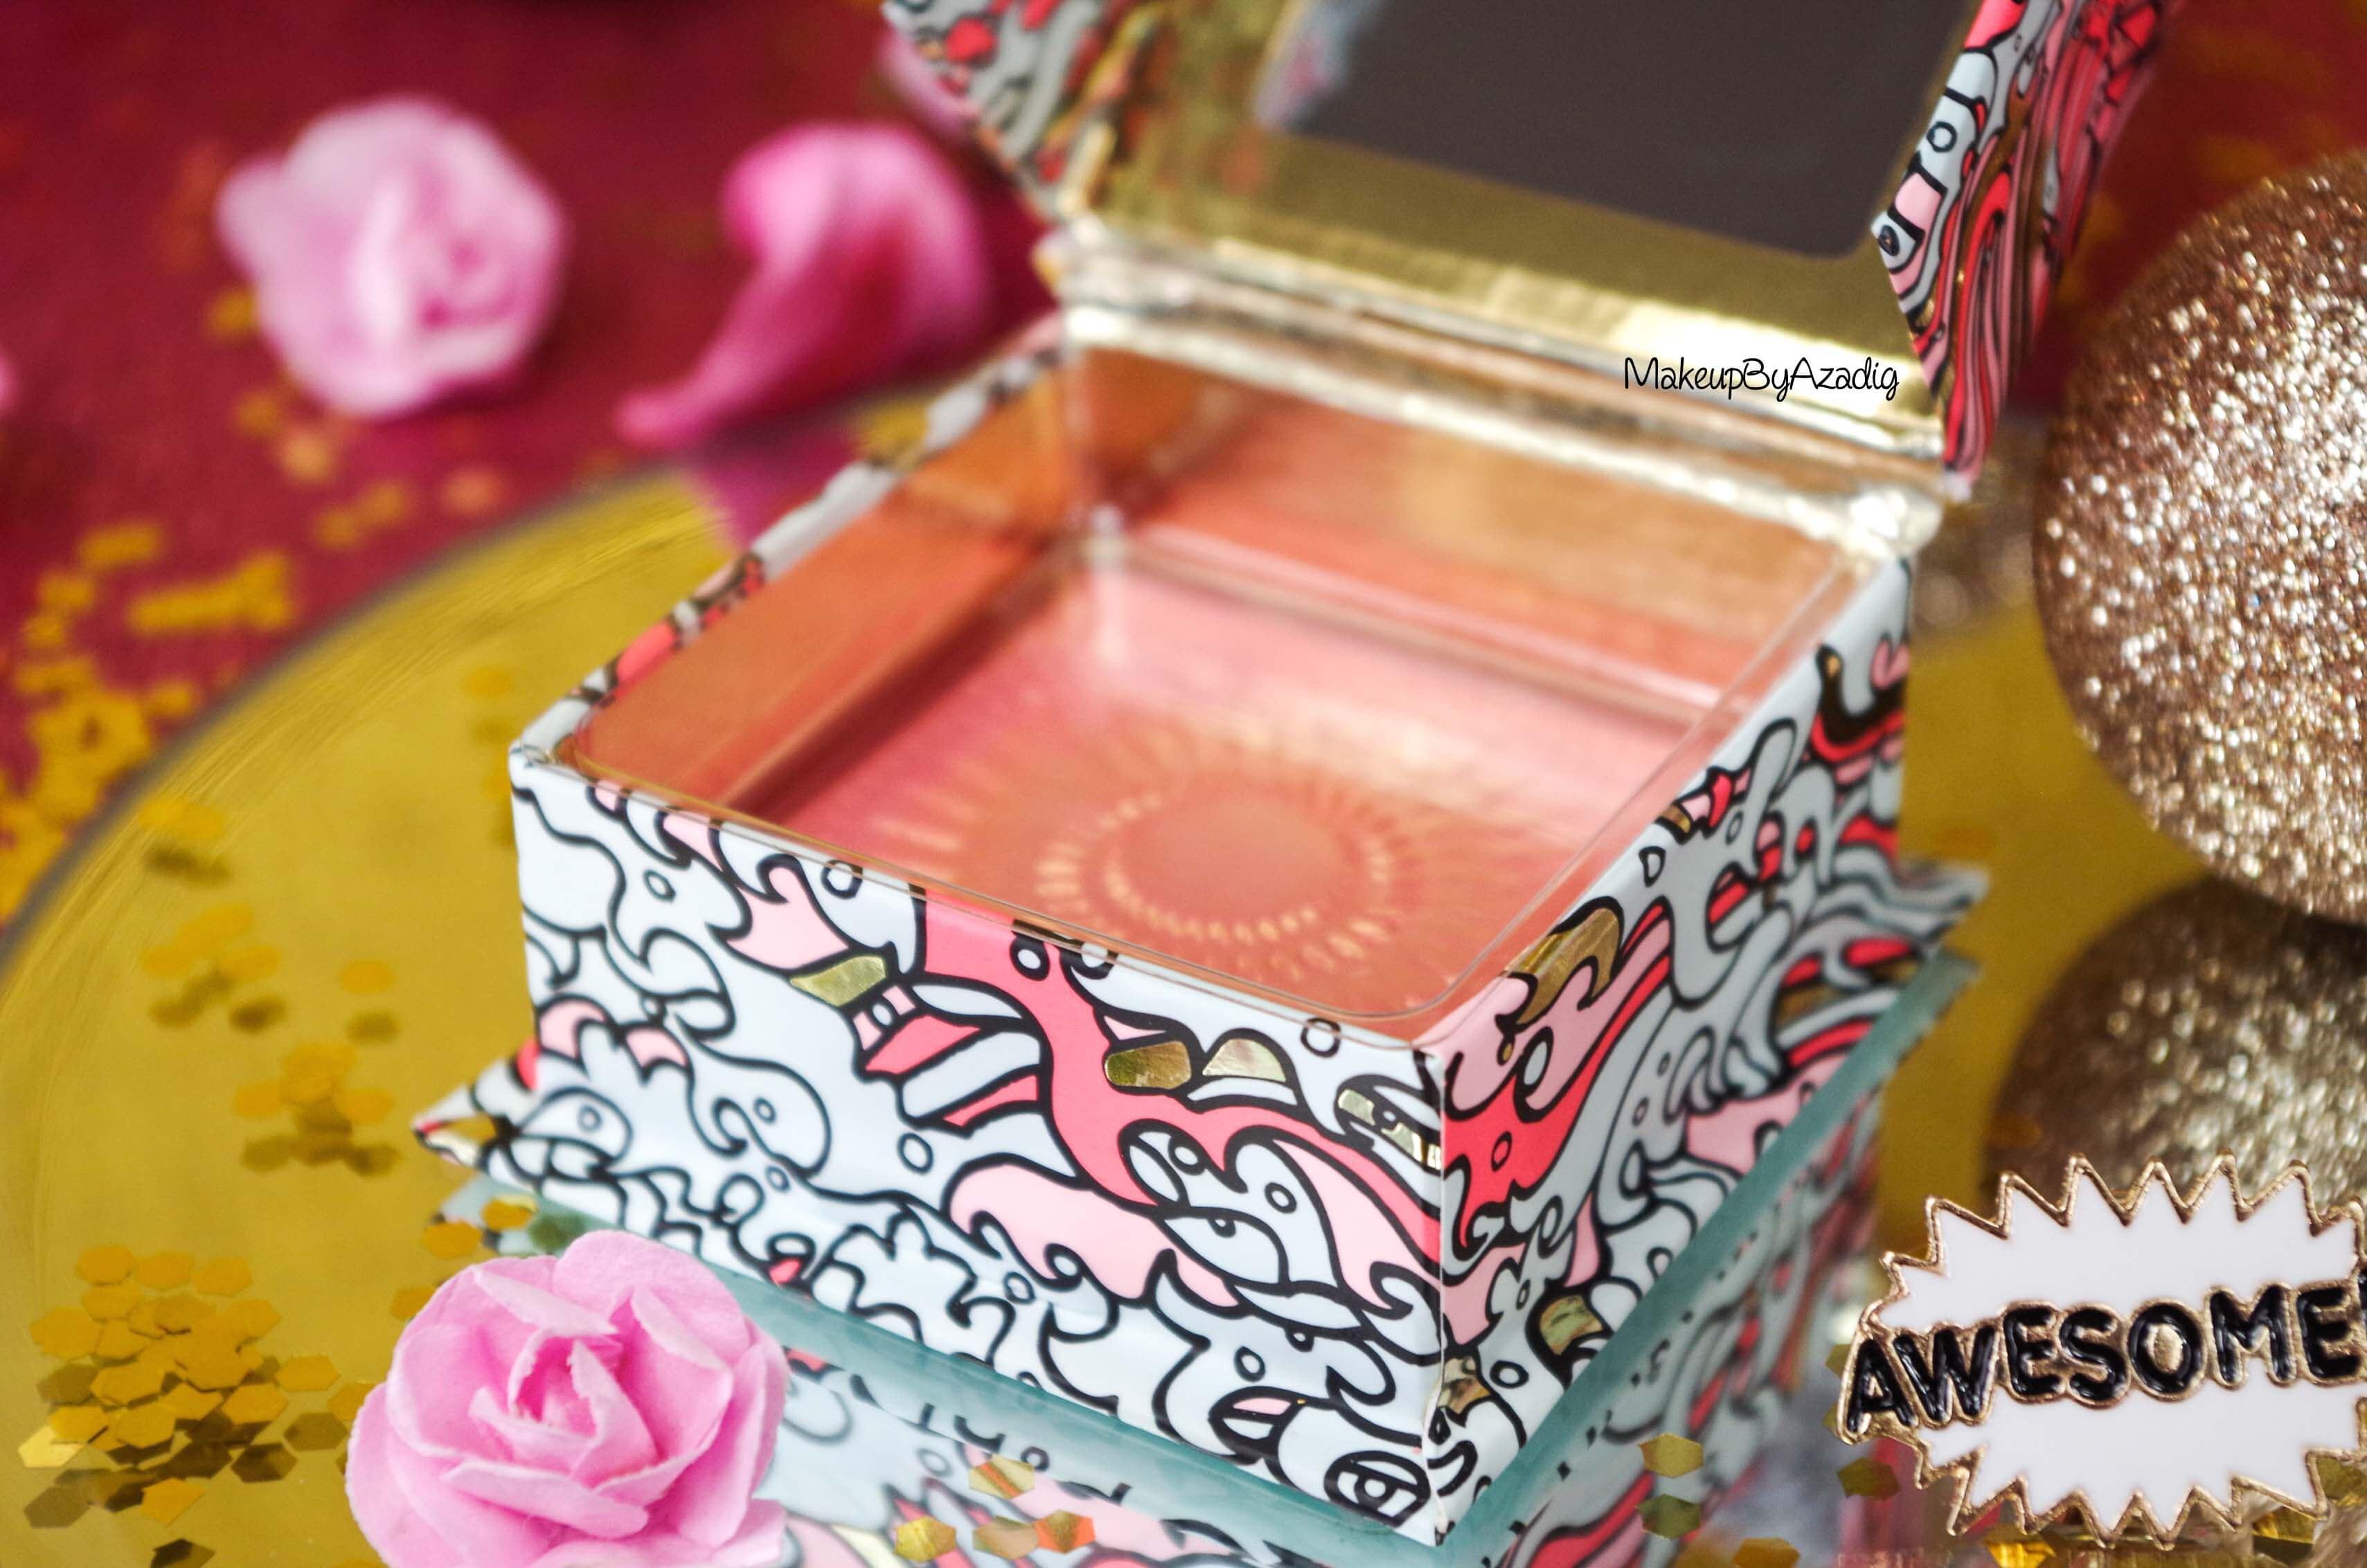 packaging-revue-review-blush-benefit-galifornia-san-francisco-sunny-golden-pink-blush-avis-prix-sephora-makeupbyazadig-coachella